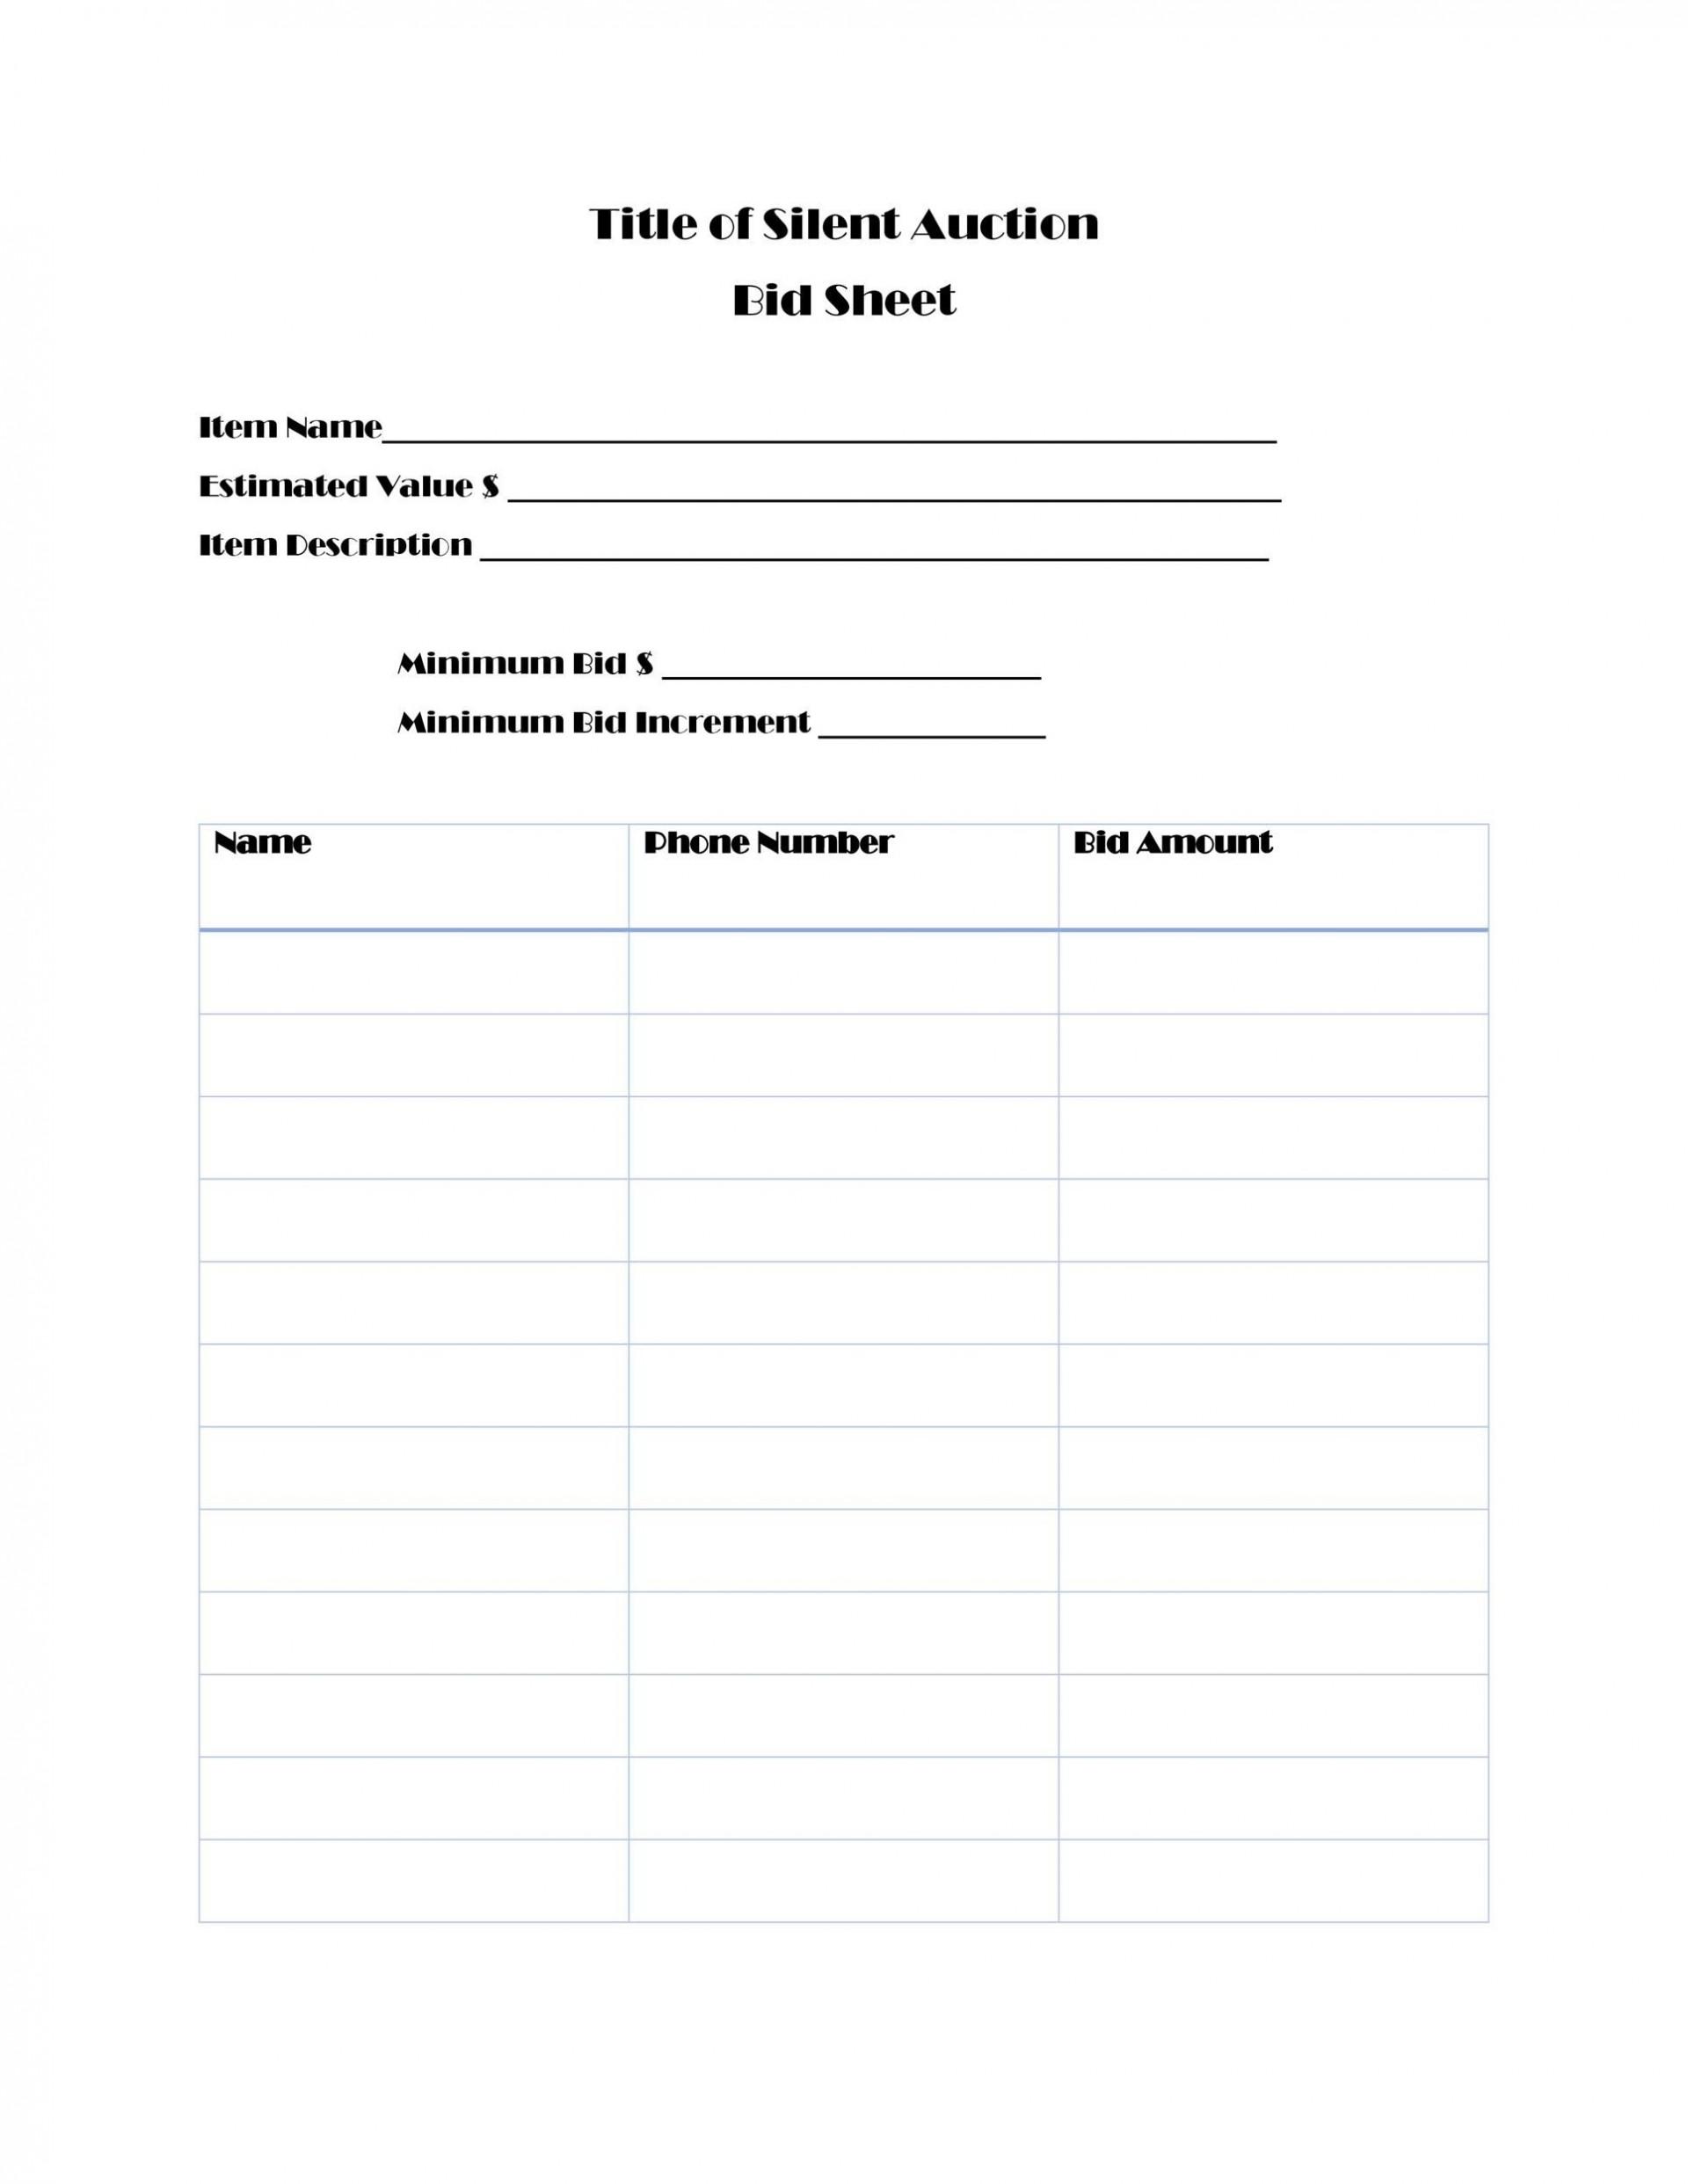 003 Impressive Sample Silent Auction Bid Sheet Free Photo  Printable Template Download1920